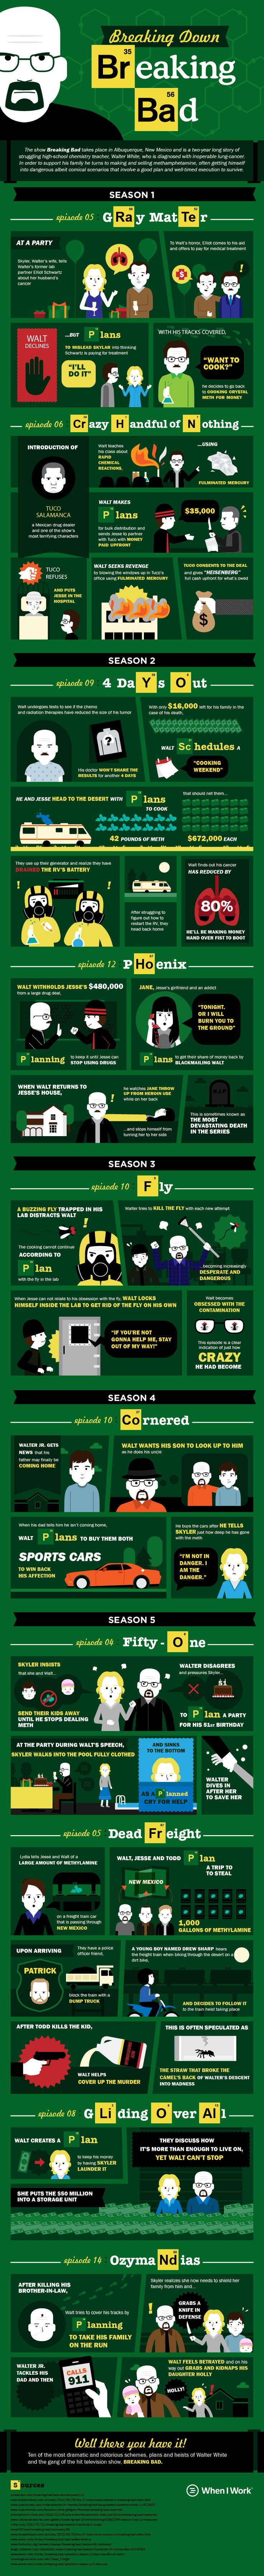 Breaking Down Breaking Bad #infographic #BreakingBad #TVSeason